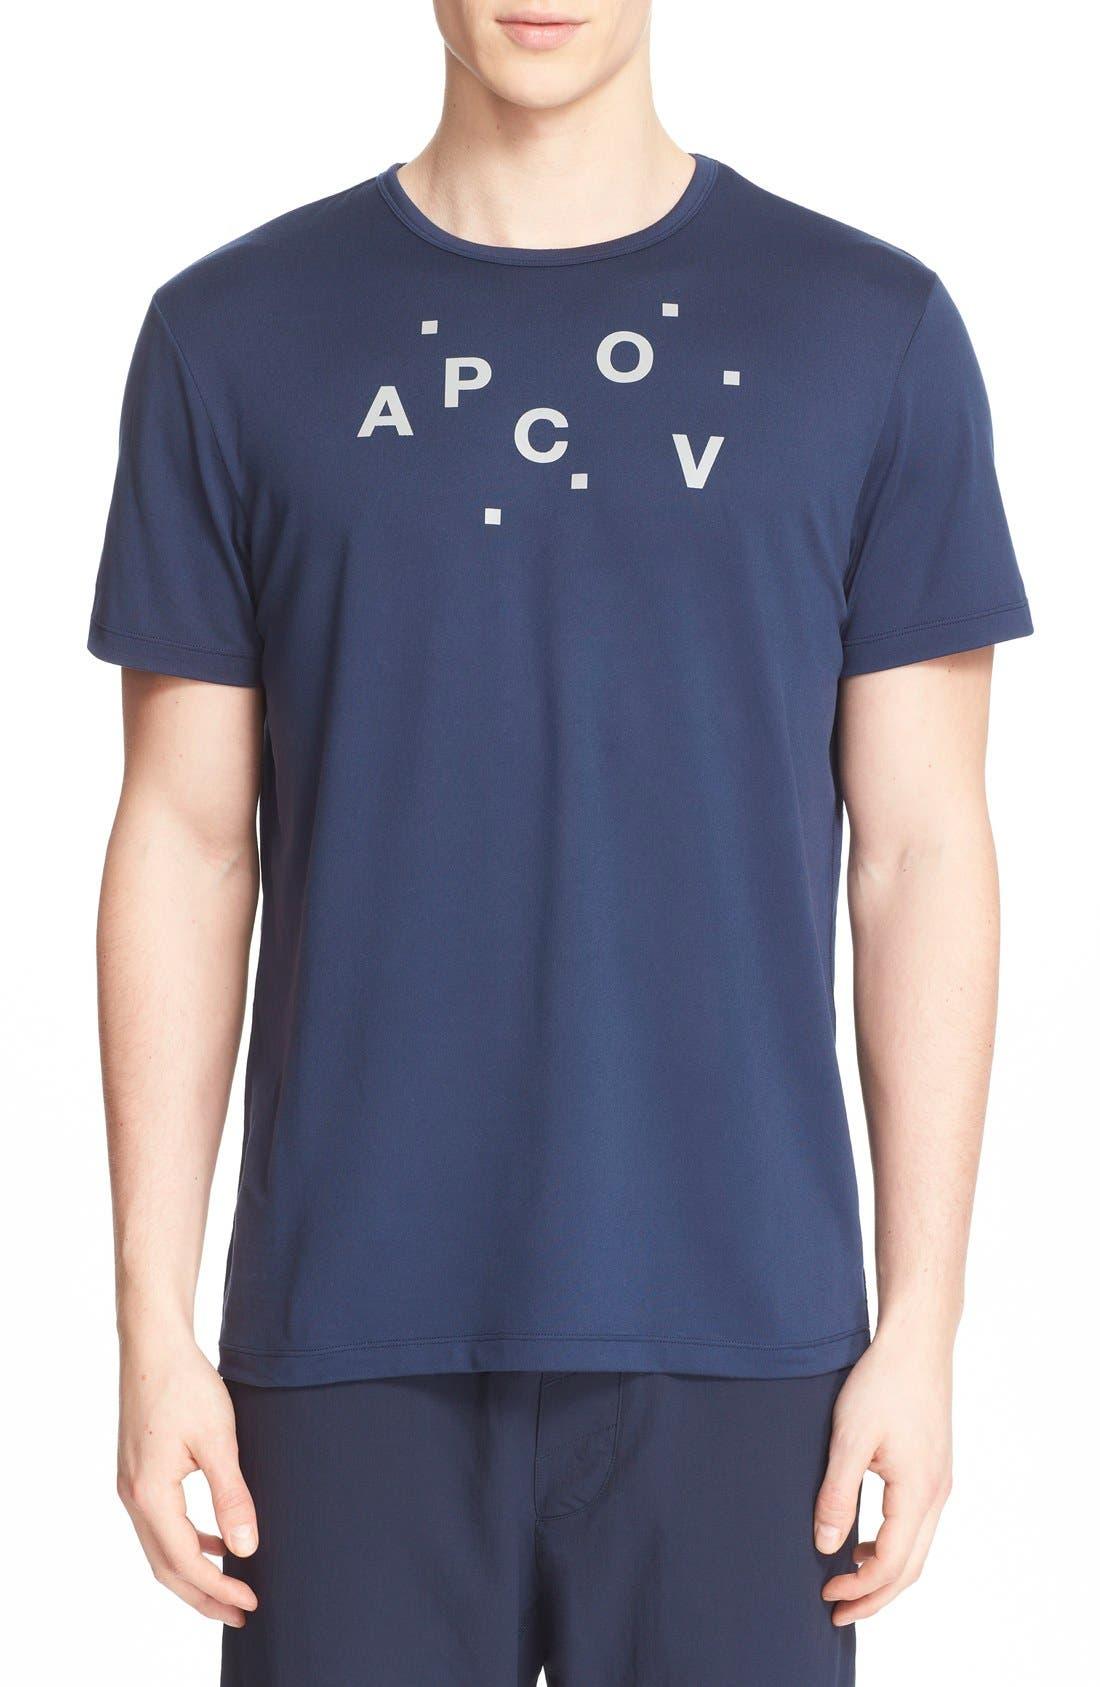 and Outdoor Voices 'Austin' Crewneck Logo T-Shirt,                             Main thumbnail 1, color,                             410